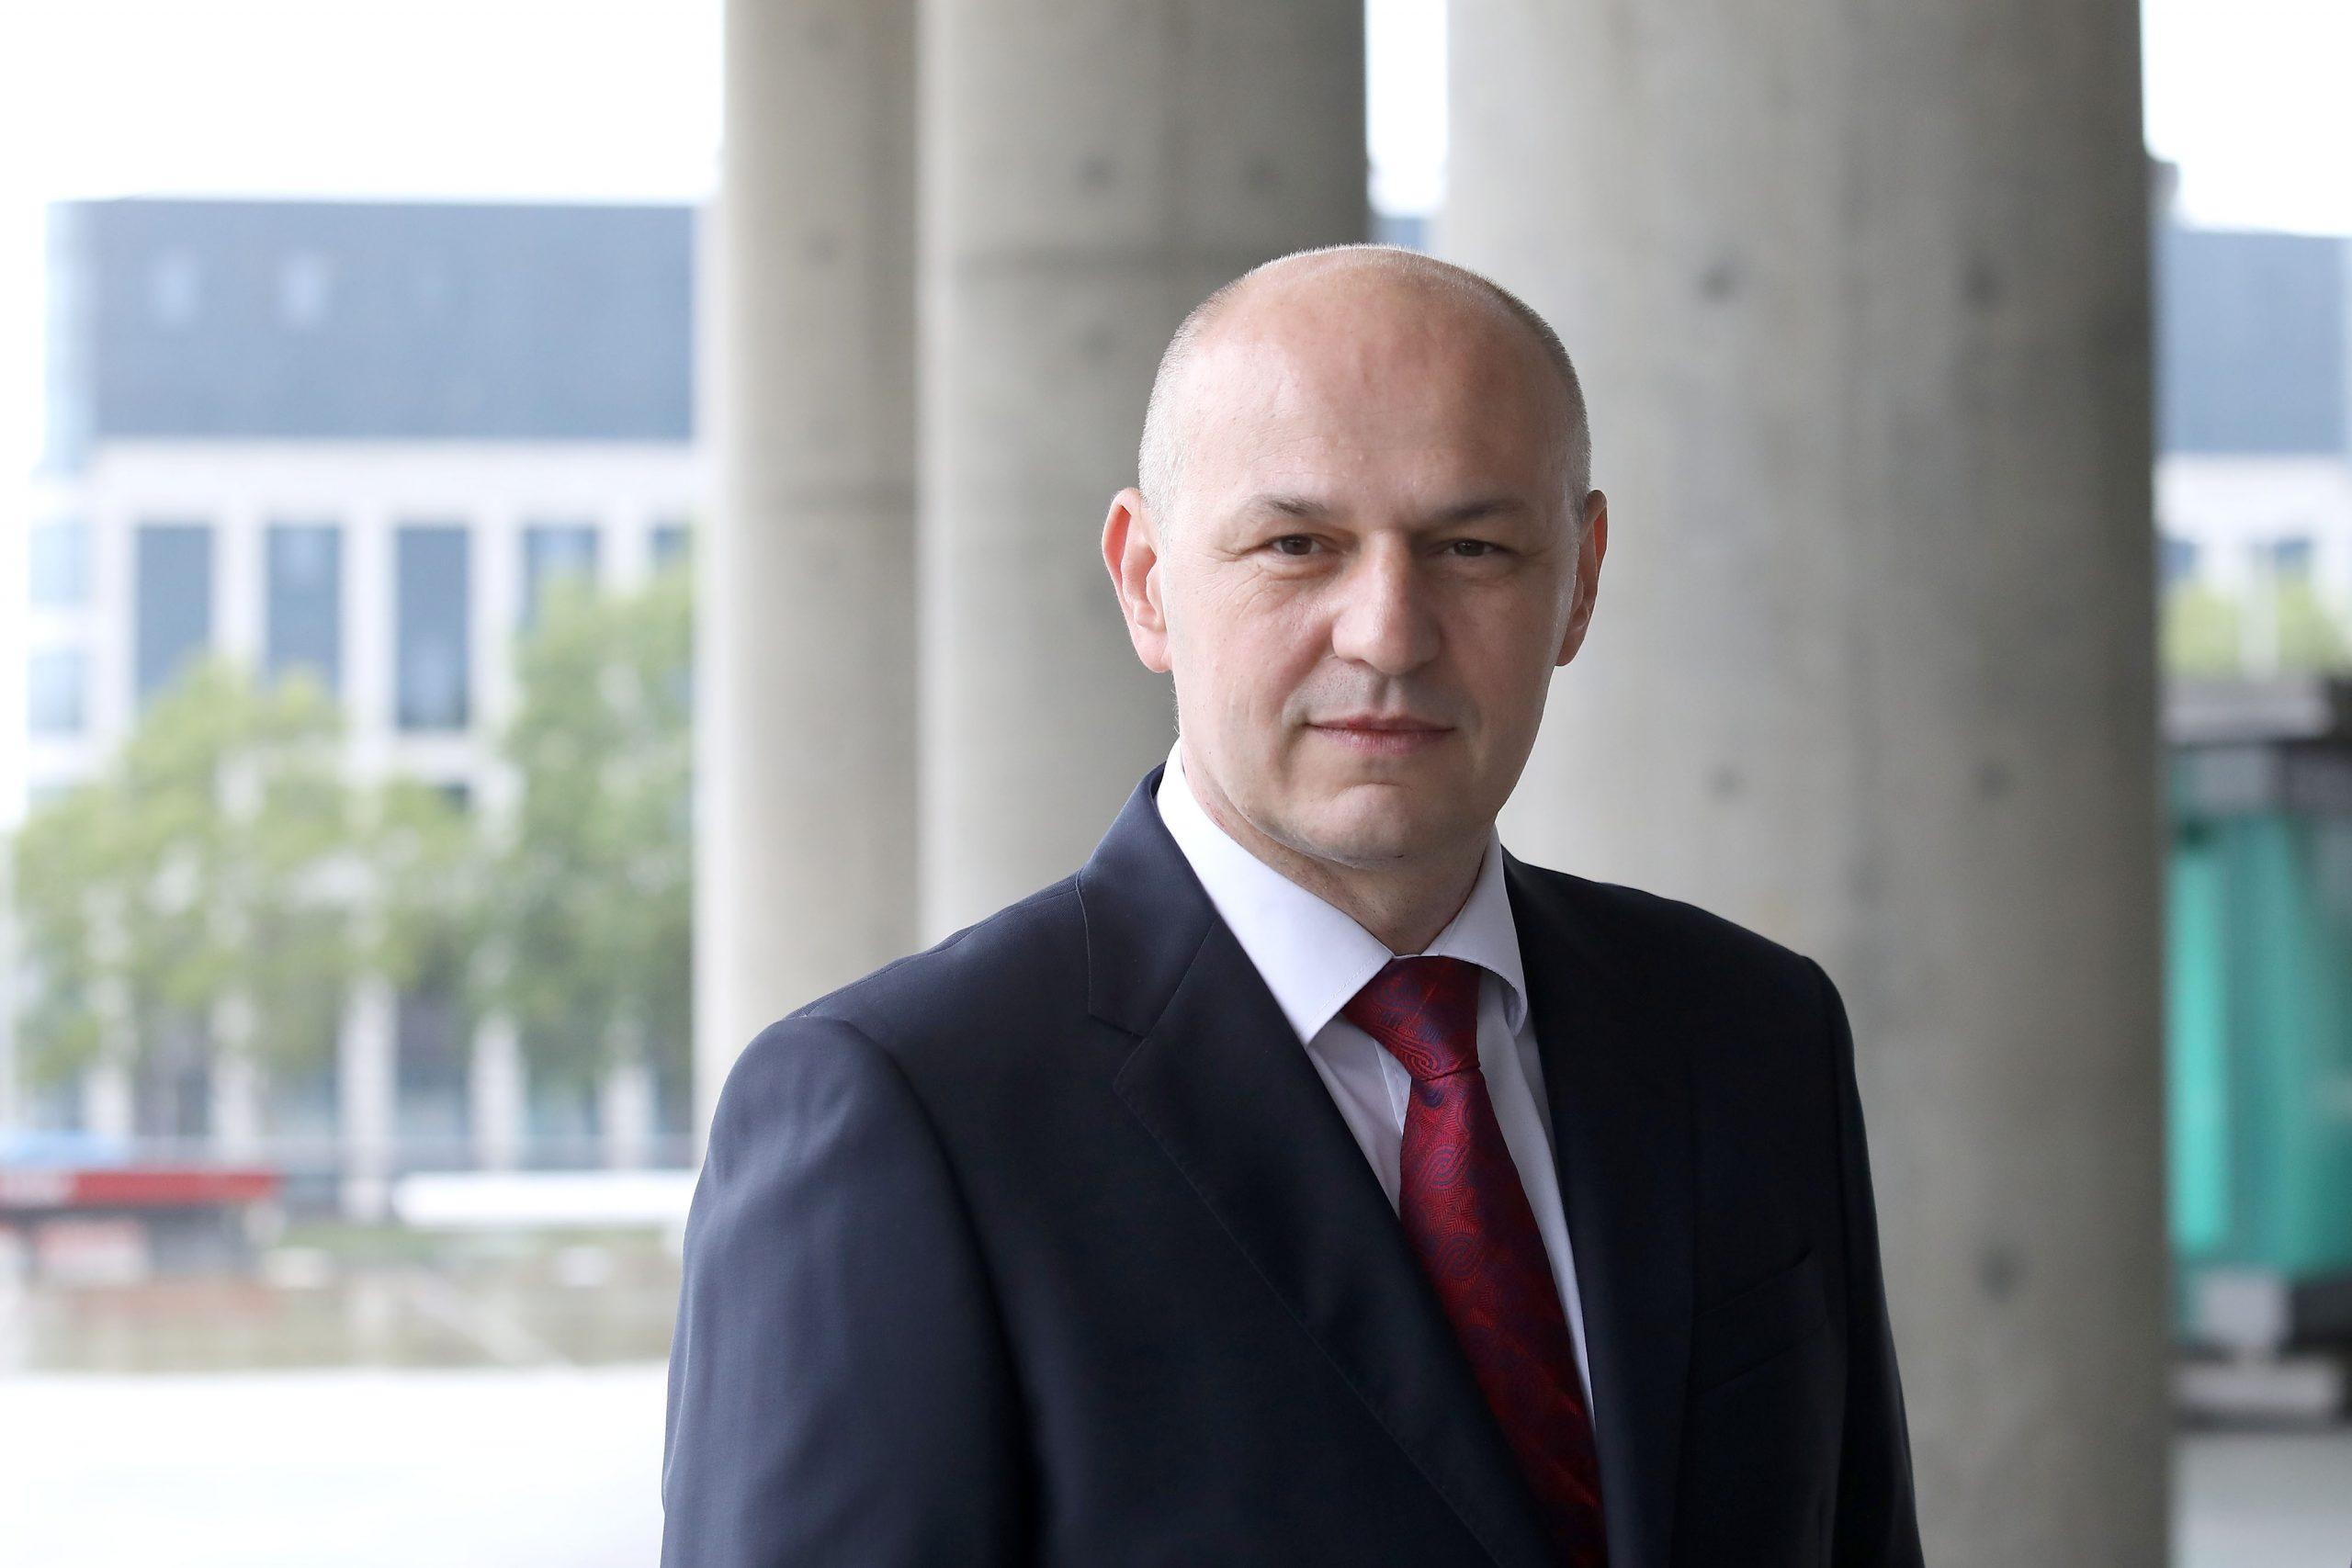 Mislav Kolakušić / Patrik Macek/PIXSELL